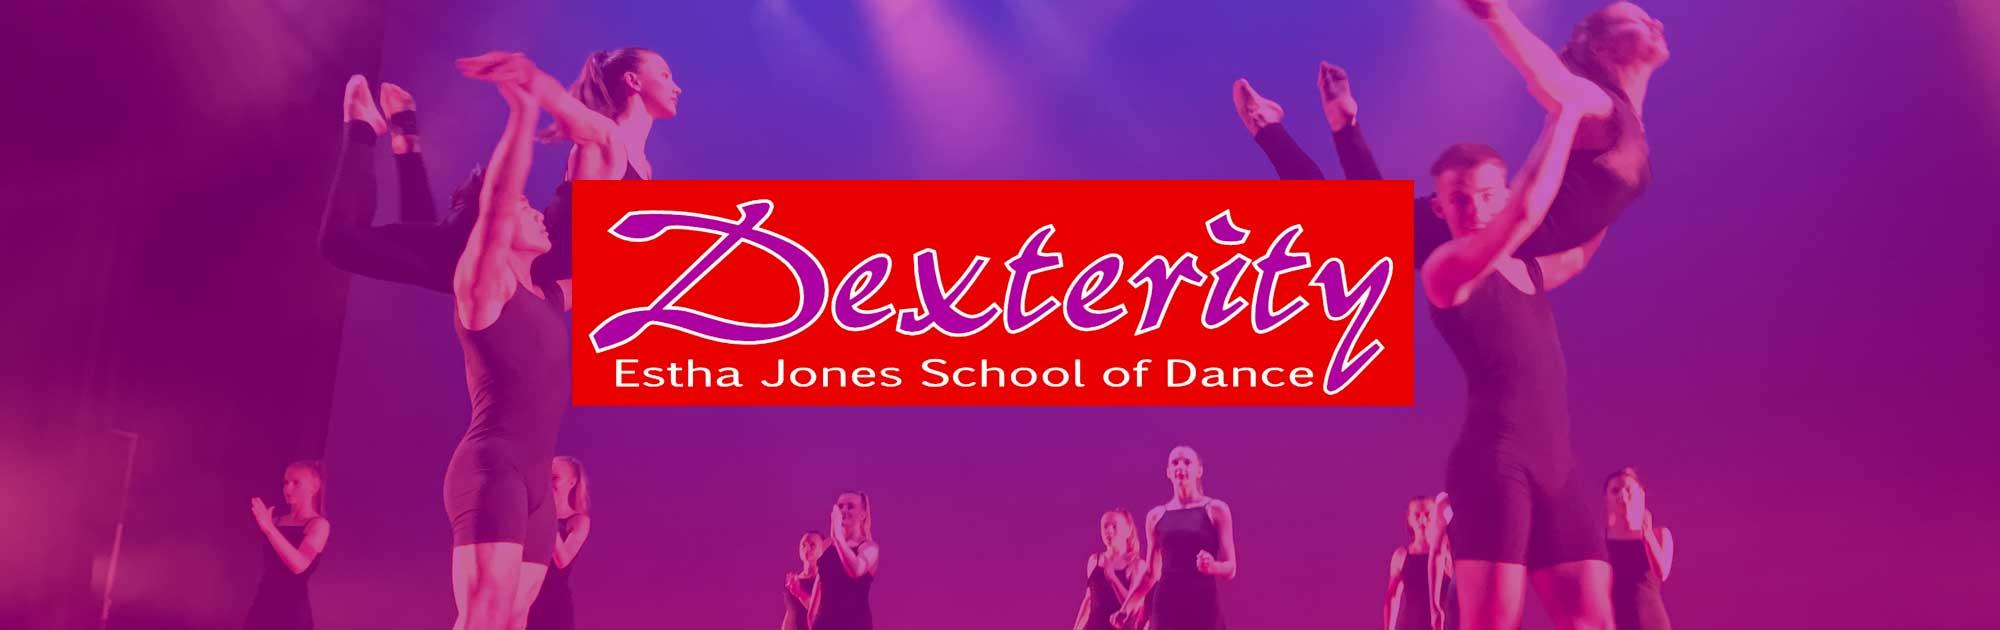 Estha Jones School of Dance logo slide